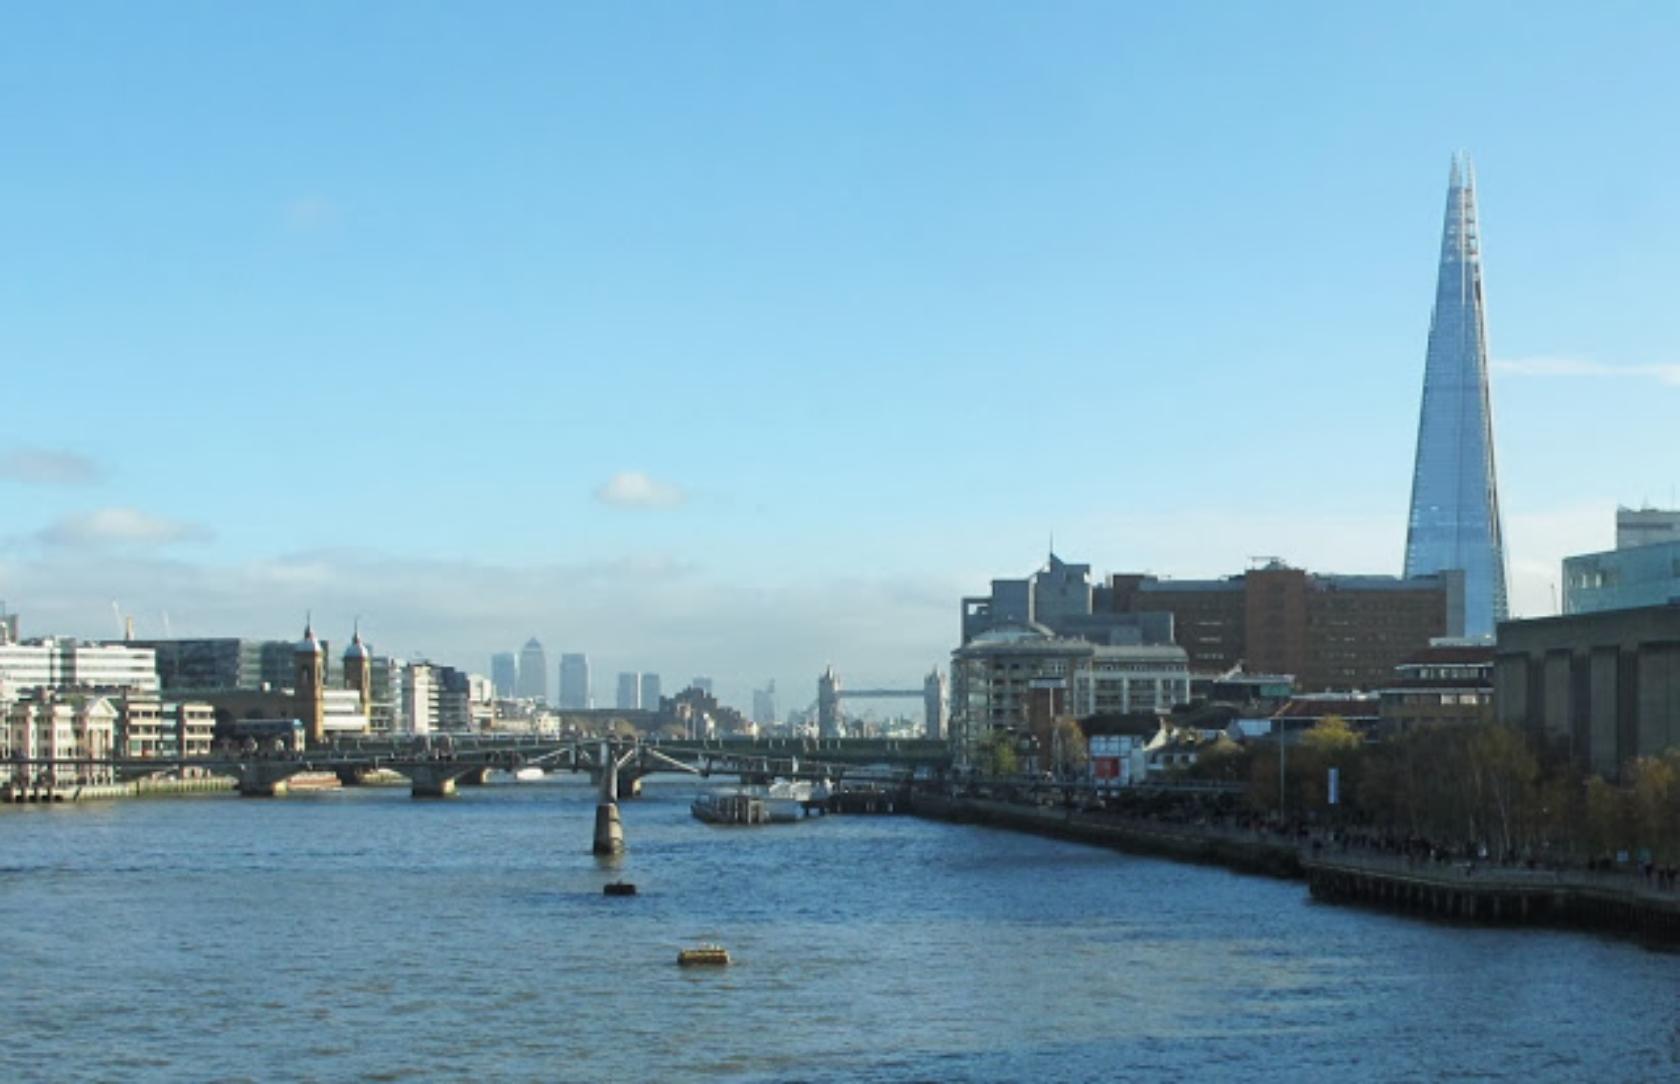 Blackfriars+Bridge_Panorama3+crppd+enhncd.jpg